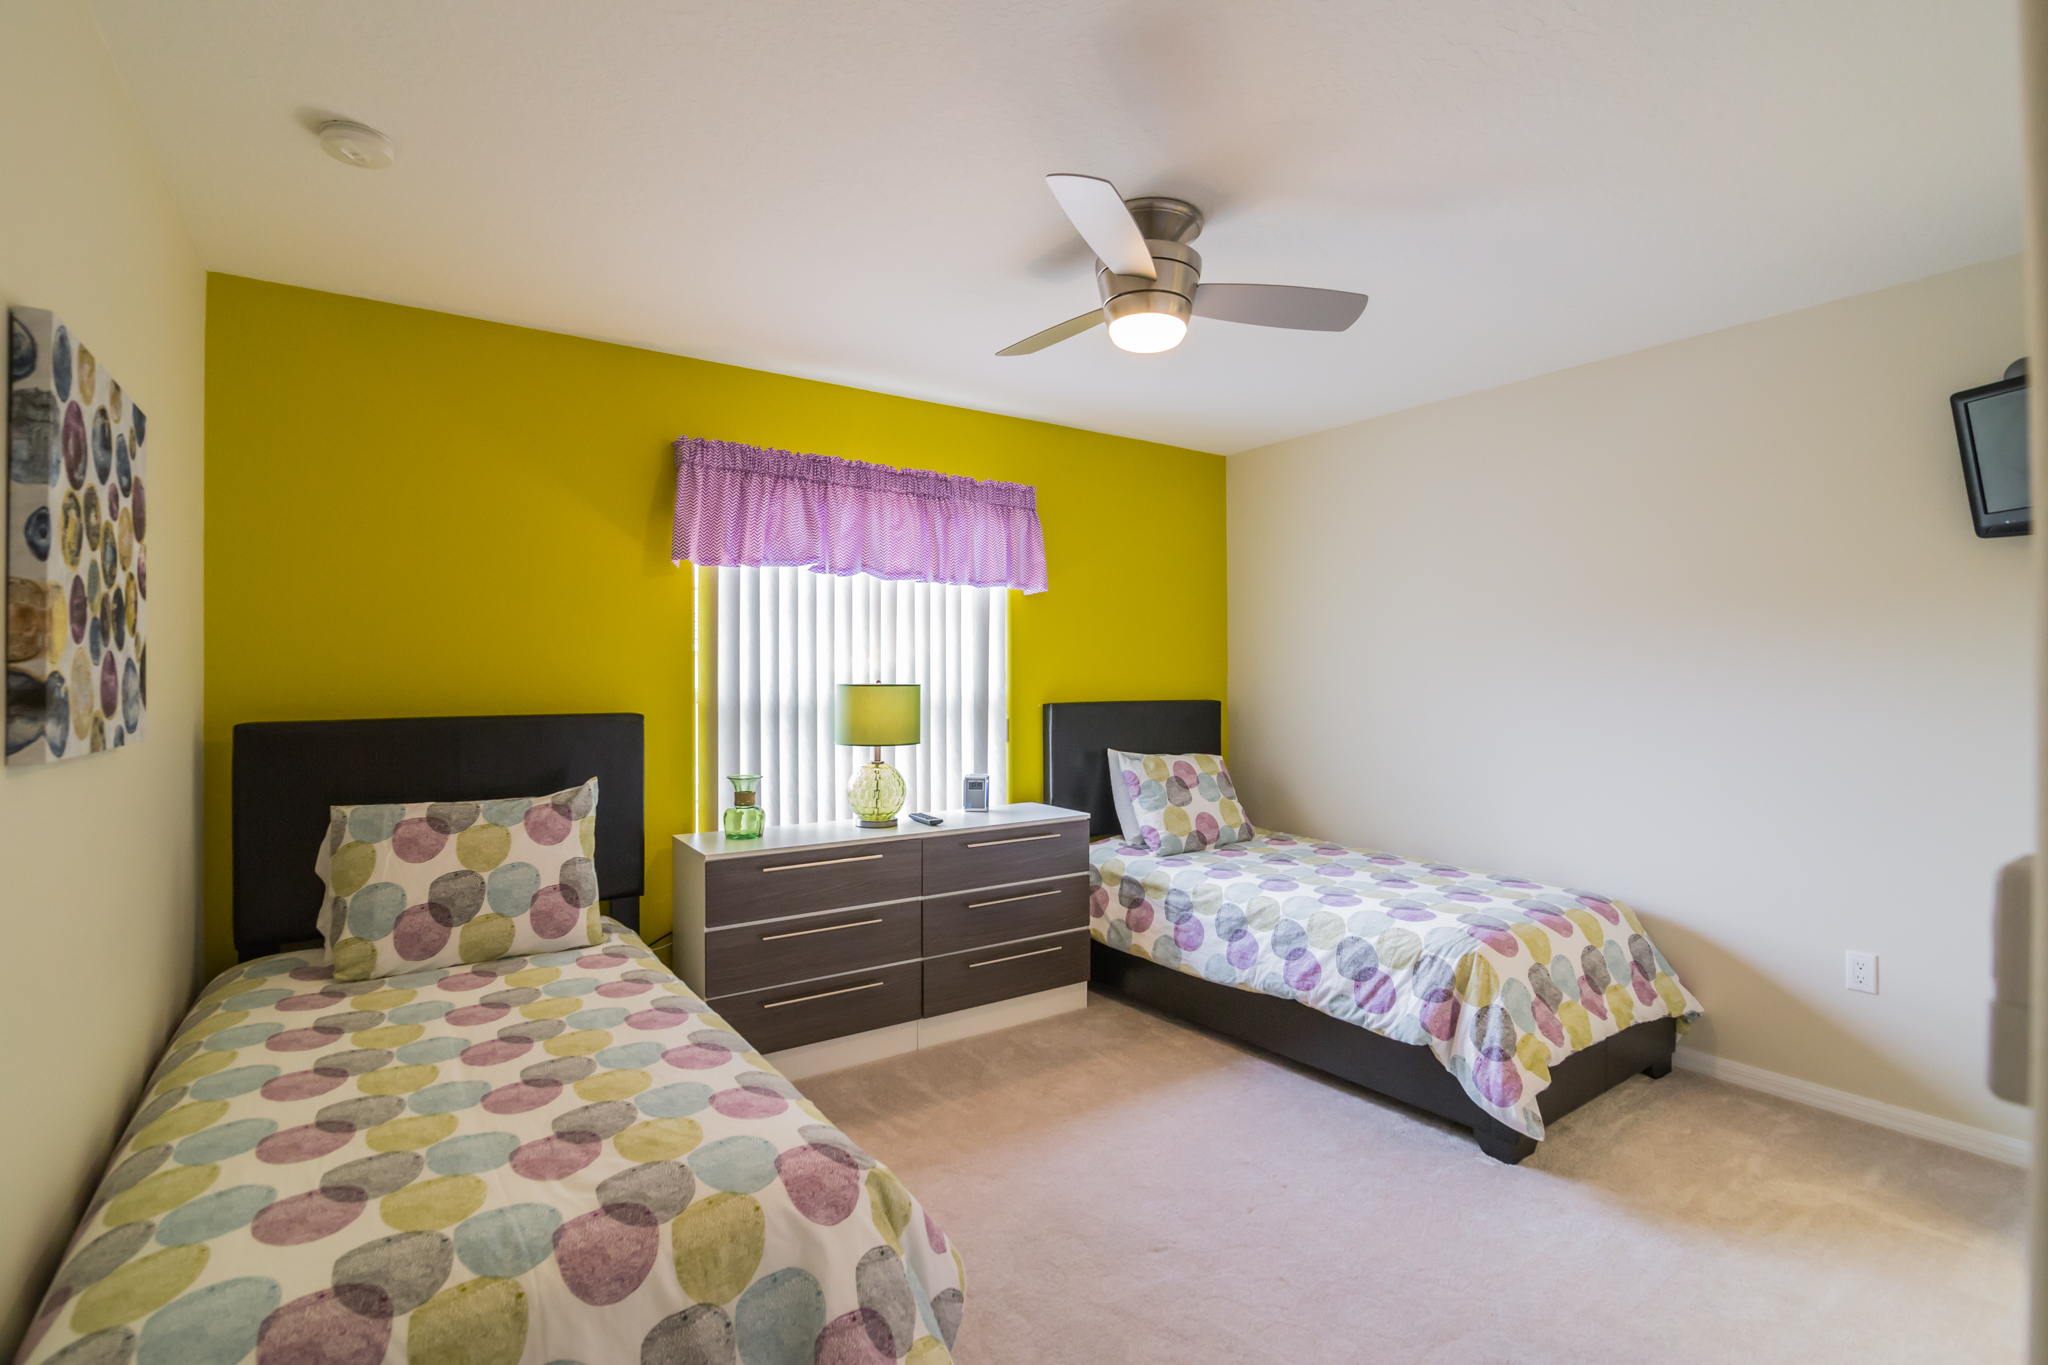 Rooms — 301 Vista View Dr, Davenport, Florida